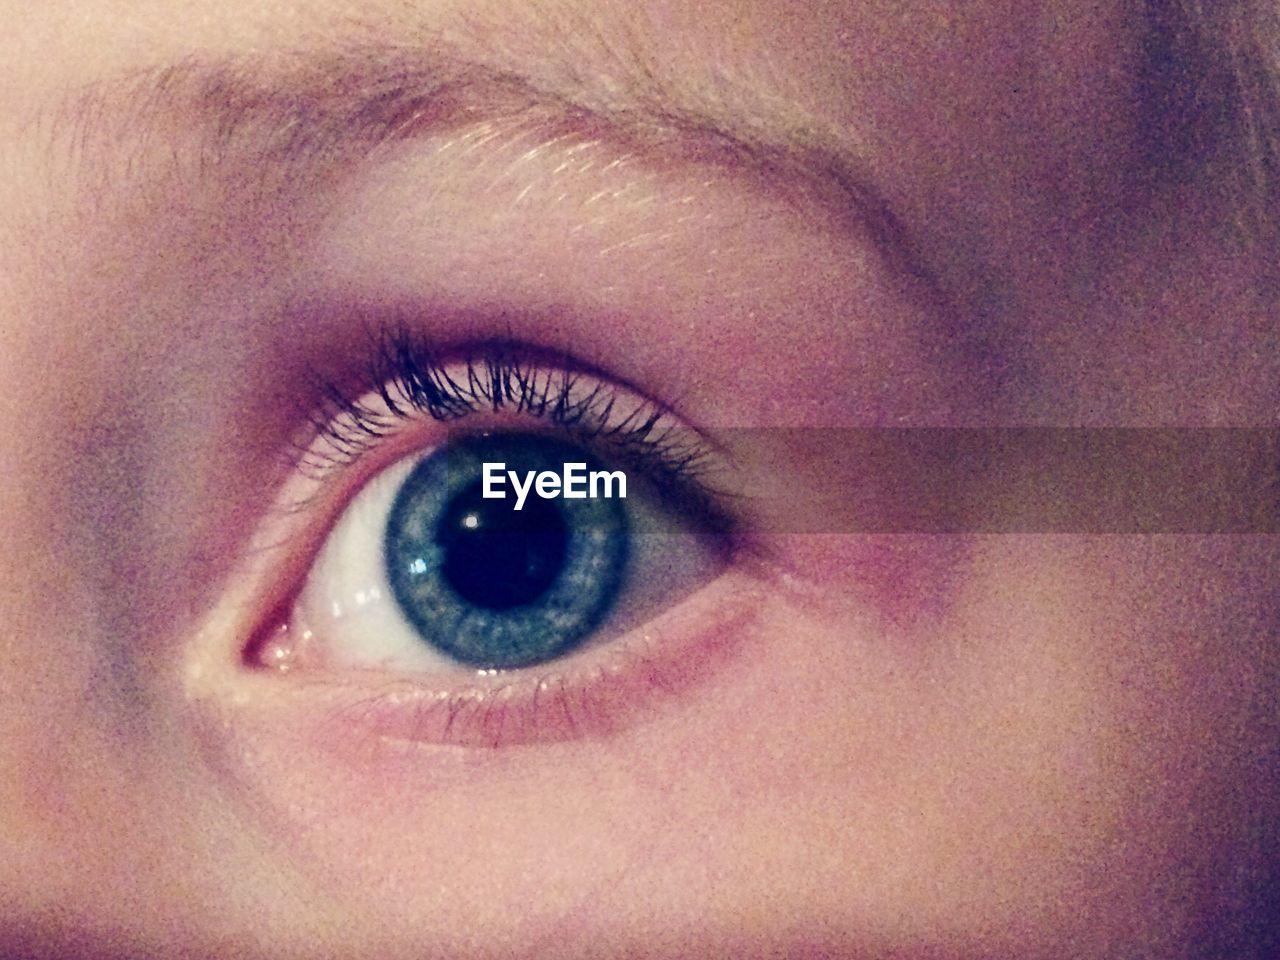 human eye, human body part, eyelash, one person, eyesight, eyeball, sensory perception, close-up, looking at camera, eyebrow, iris - eye, real people, portrait, indoors, day, people, adult